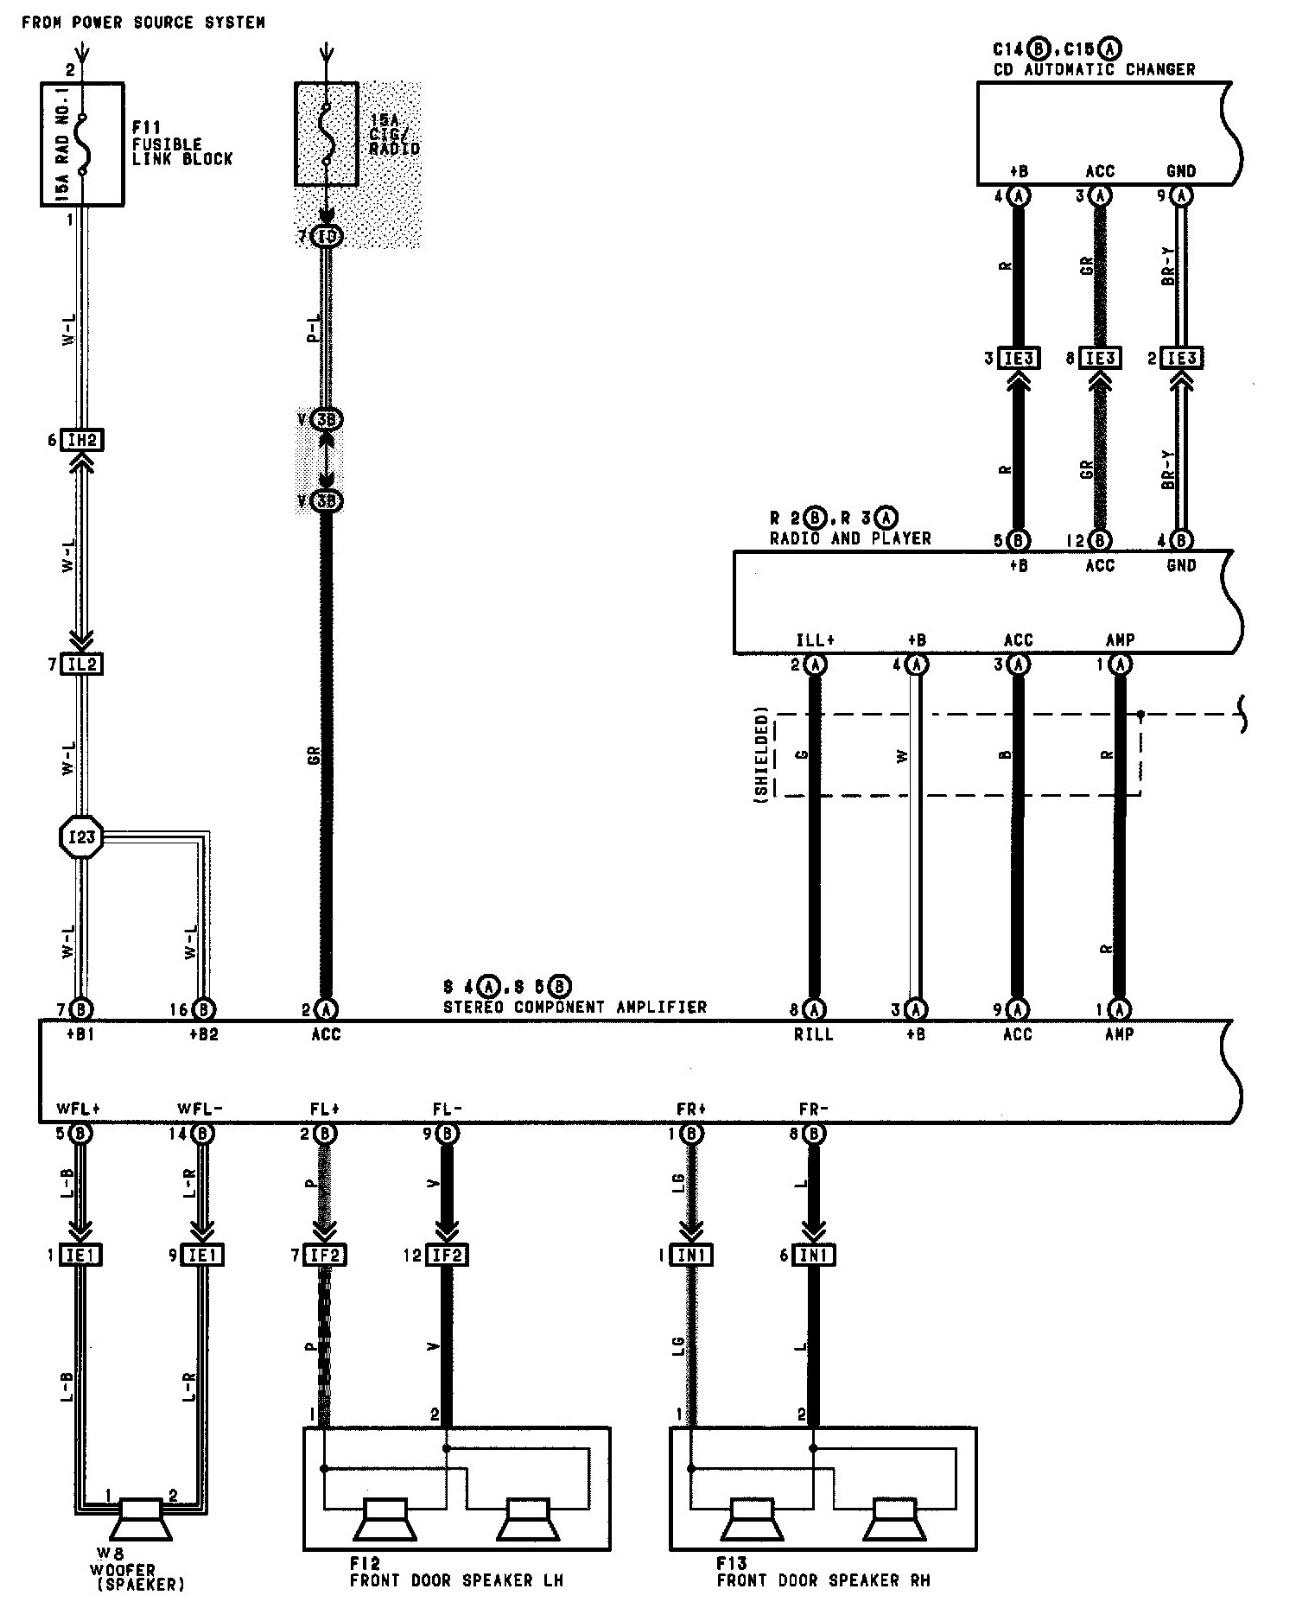 Radio Teleswitch Wiring Diagram